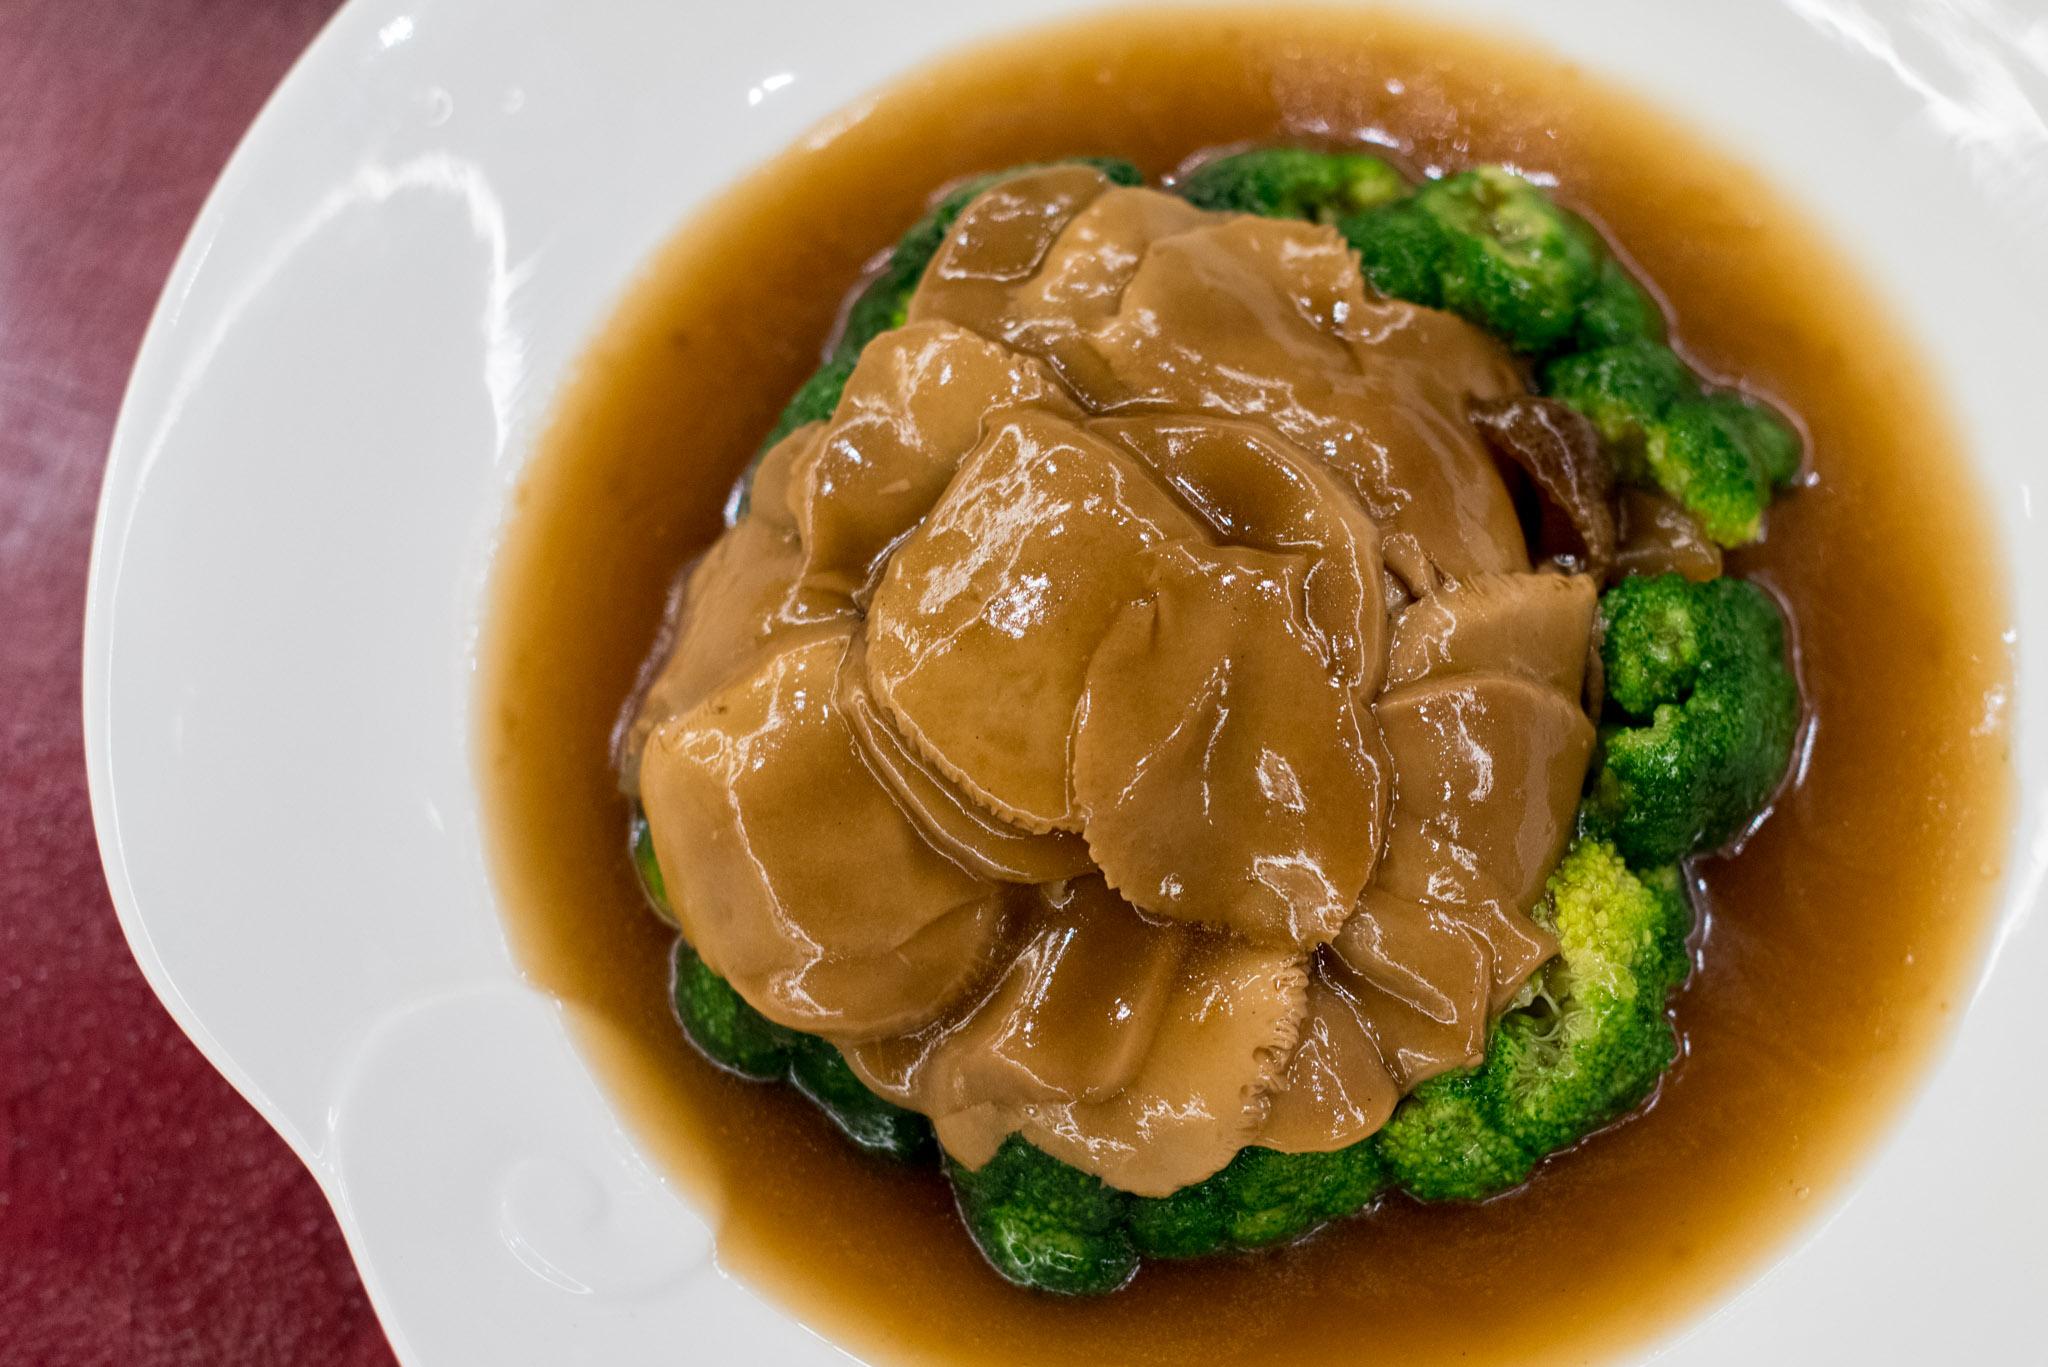 Braised Sea Cucumber & Ling Zhi Mushroom with Broccoli  Park Hotel Clarke Quay